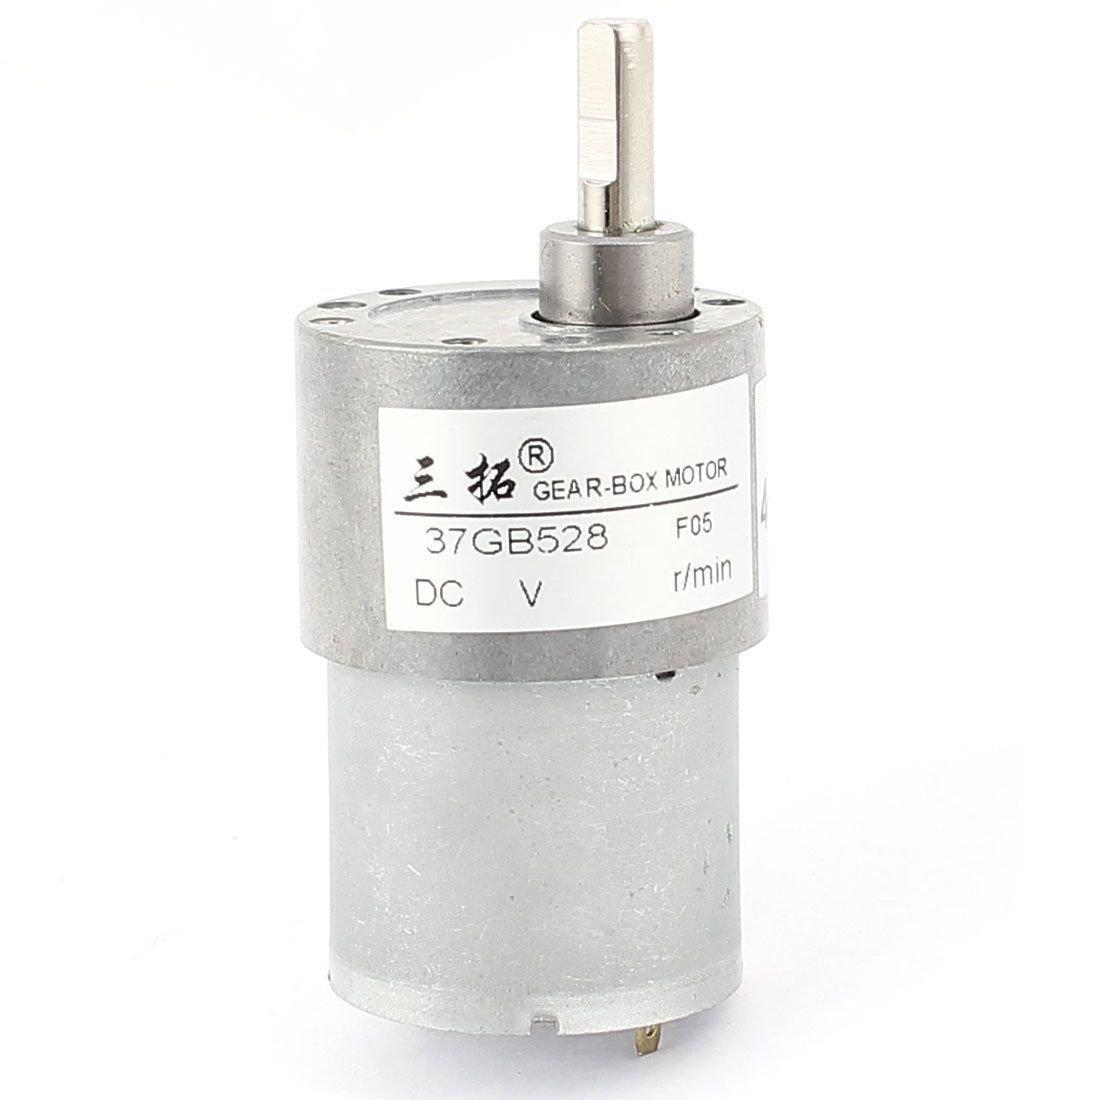 DC 12V 110RPM 0.2A 0.8KG.cm High Torque DC Gear Box Reducer Variable Speed Motor